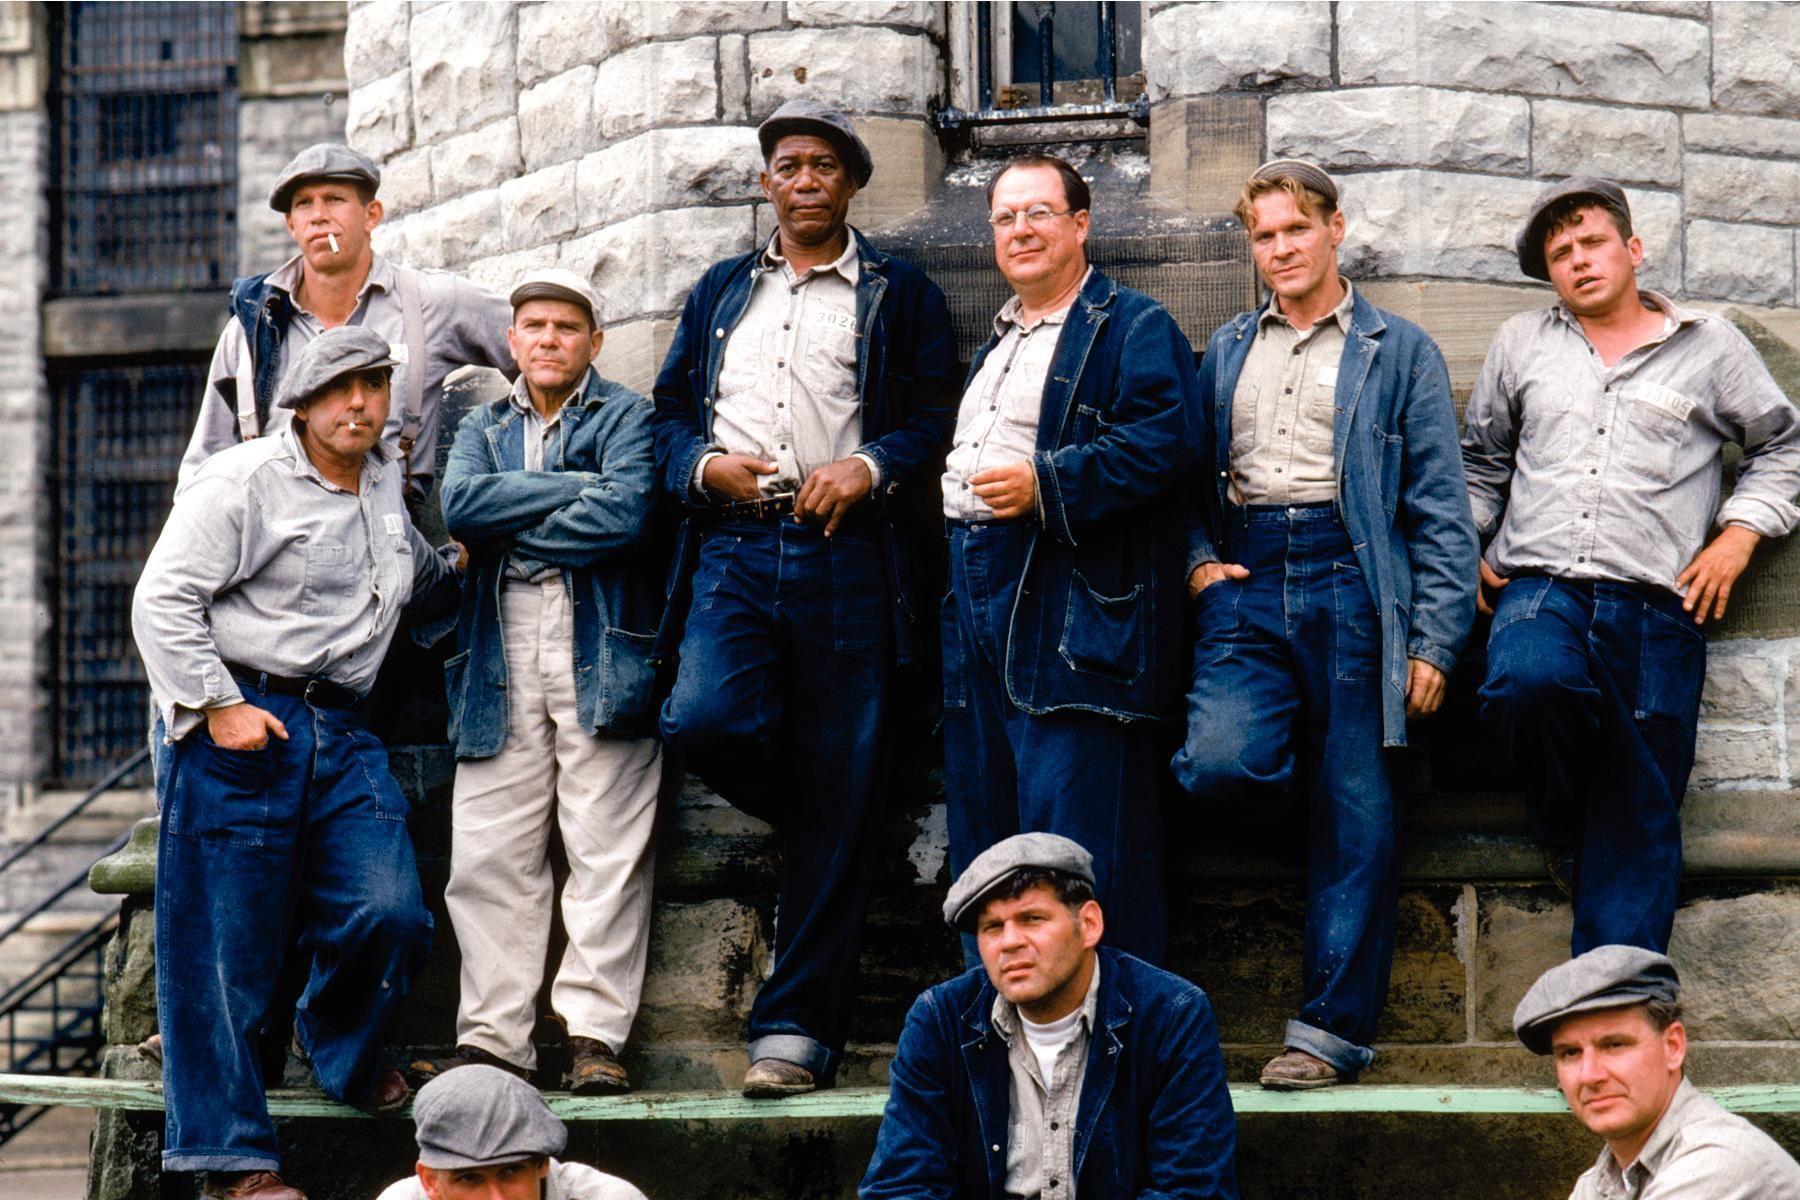 Morgan Freeman, William Sadler, Larry Brandenburg, Neil Giuntoli, Brian Libby, David Proval, and Joseph Ragno in The Shawshank Redemption (1994)